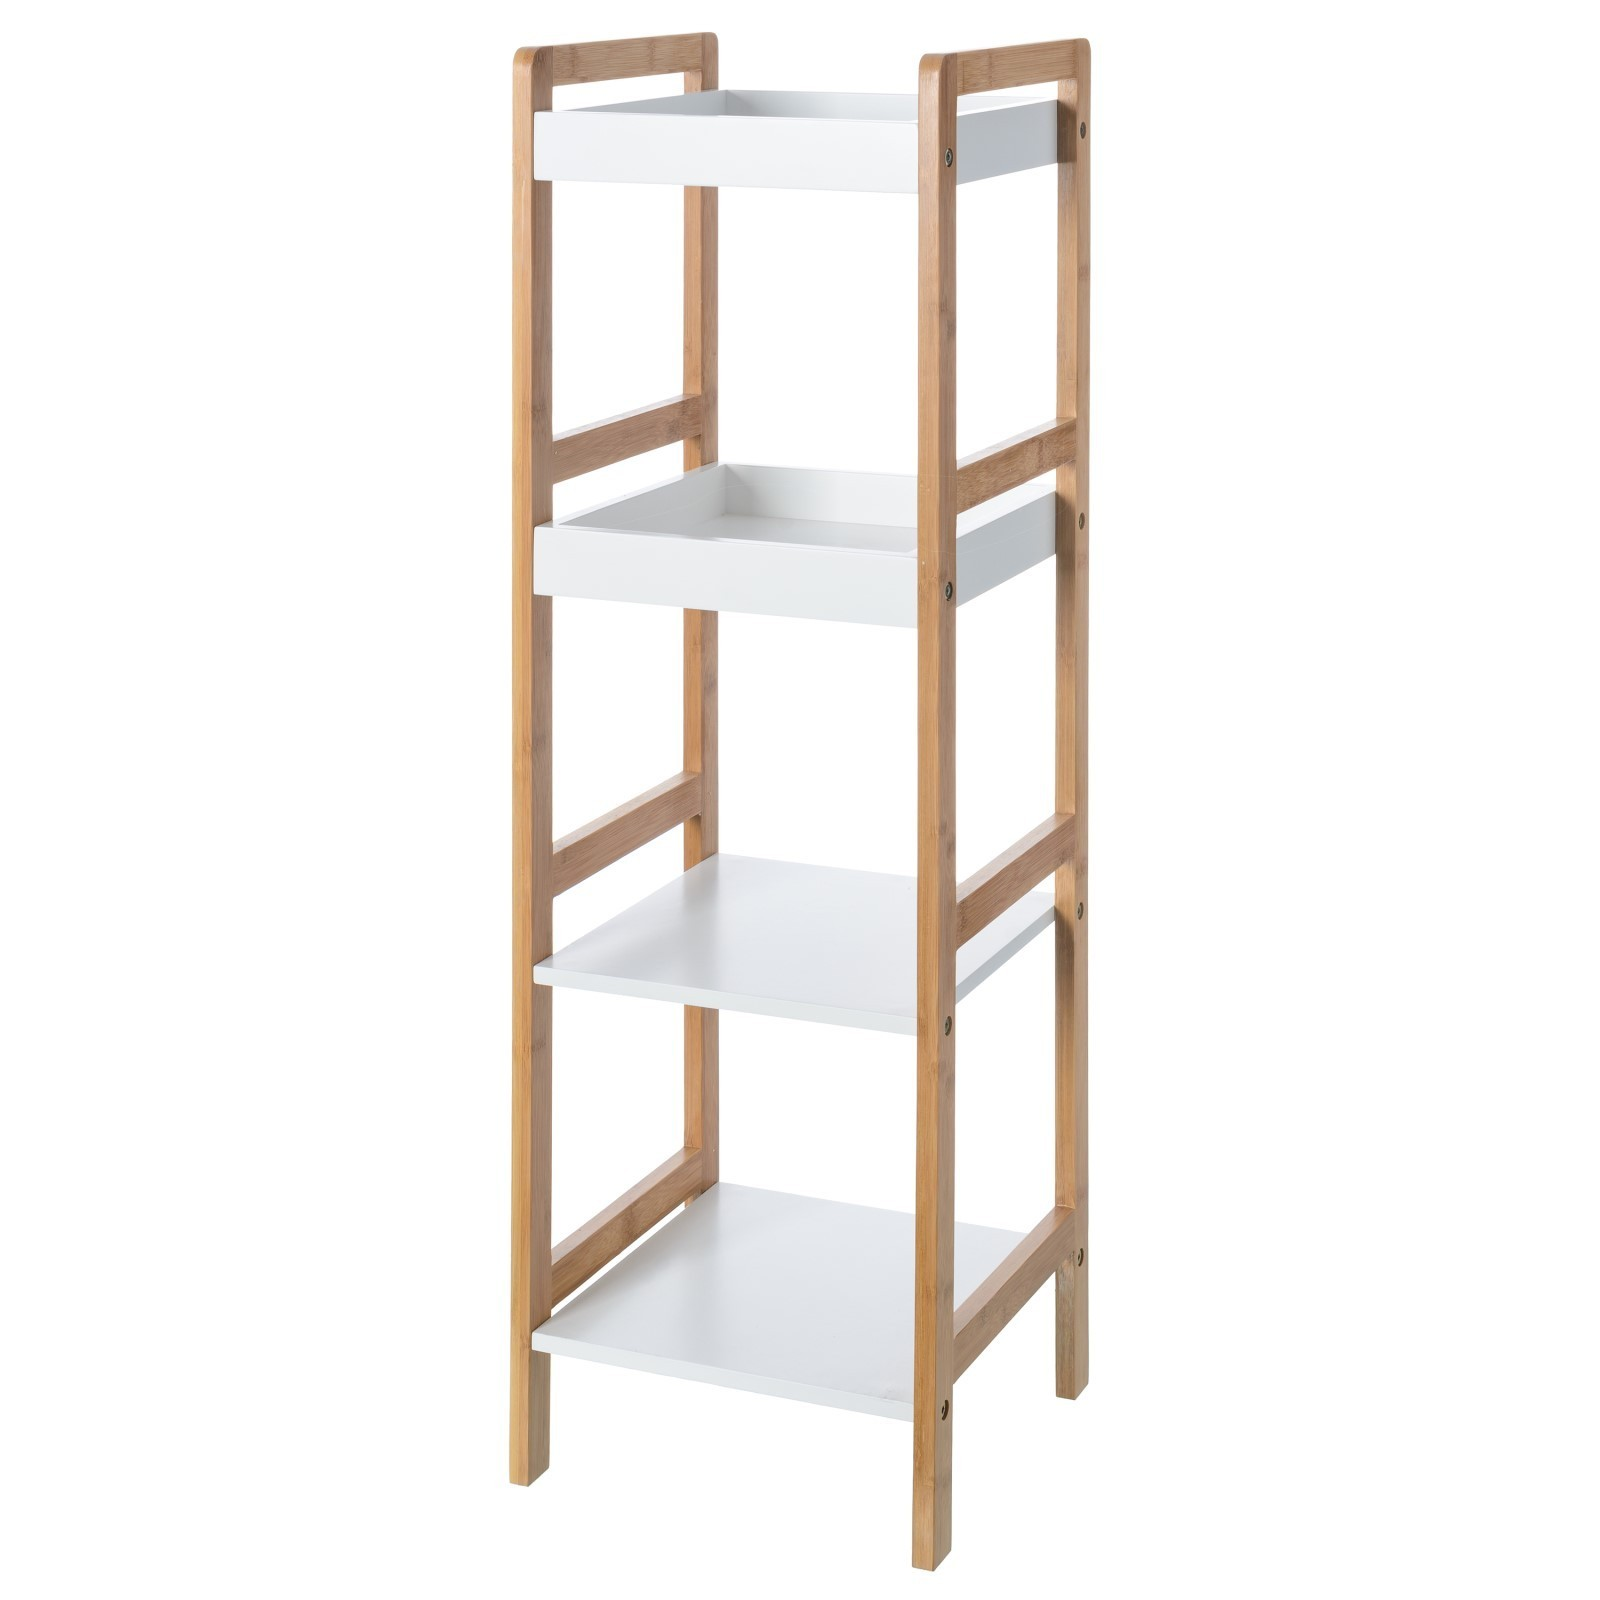 Shelf bamboo four shelves (30x29x72)